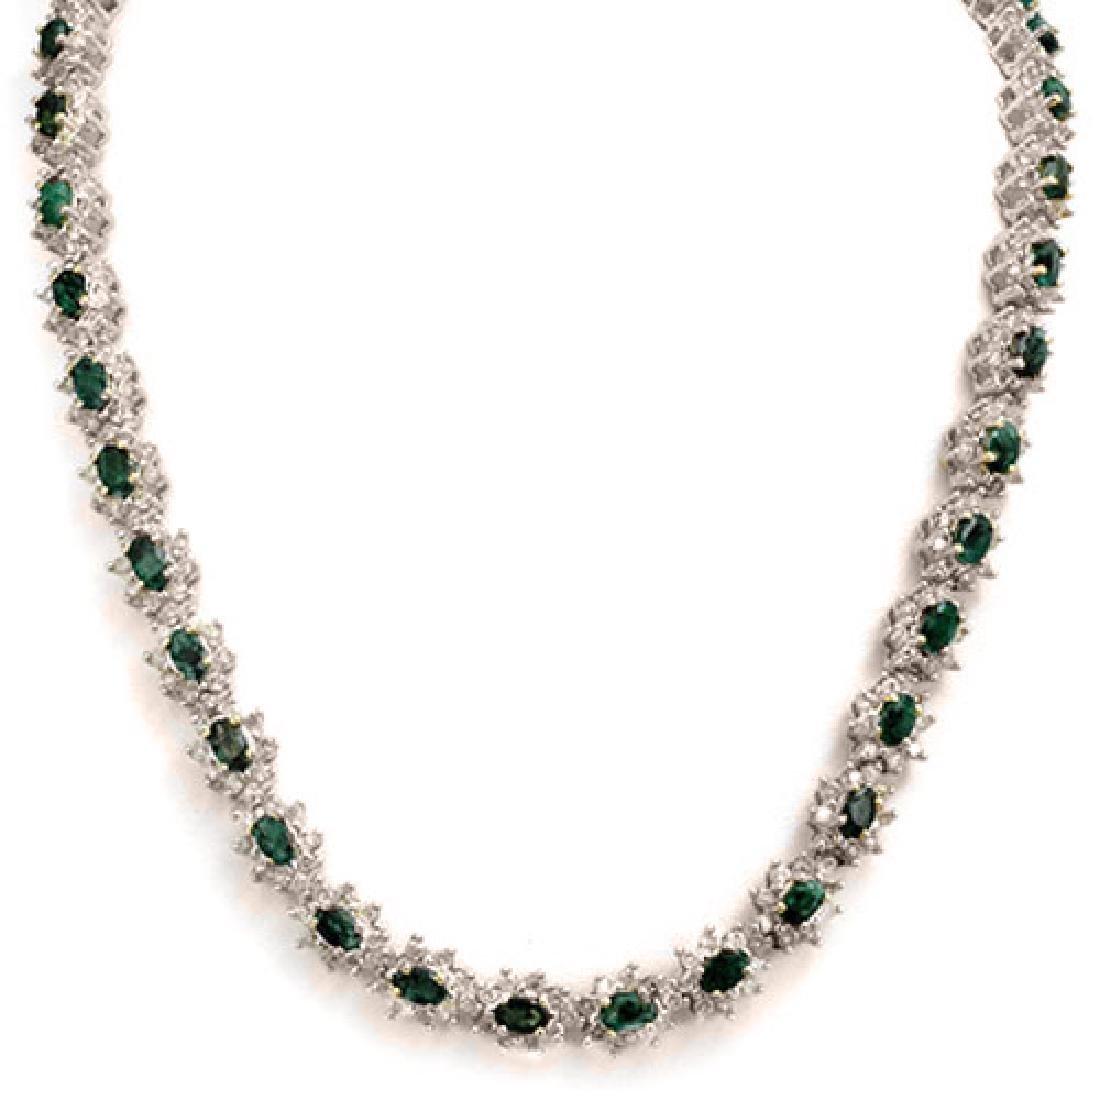 22.0 CTW Emerald & Diamond Necklace 18K White Gold